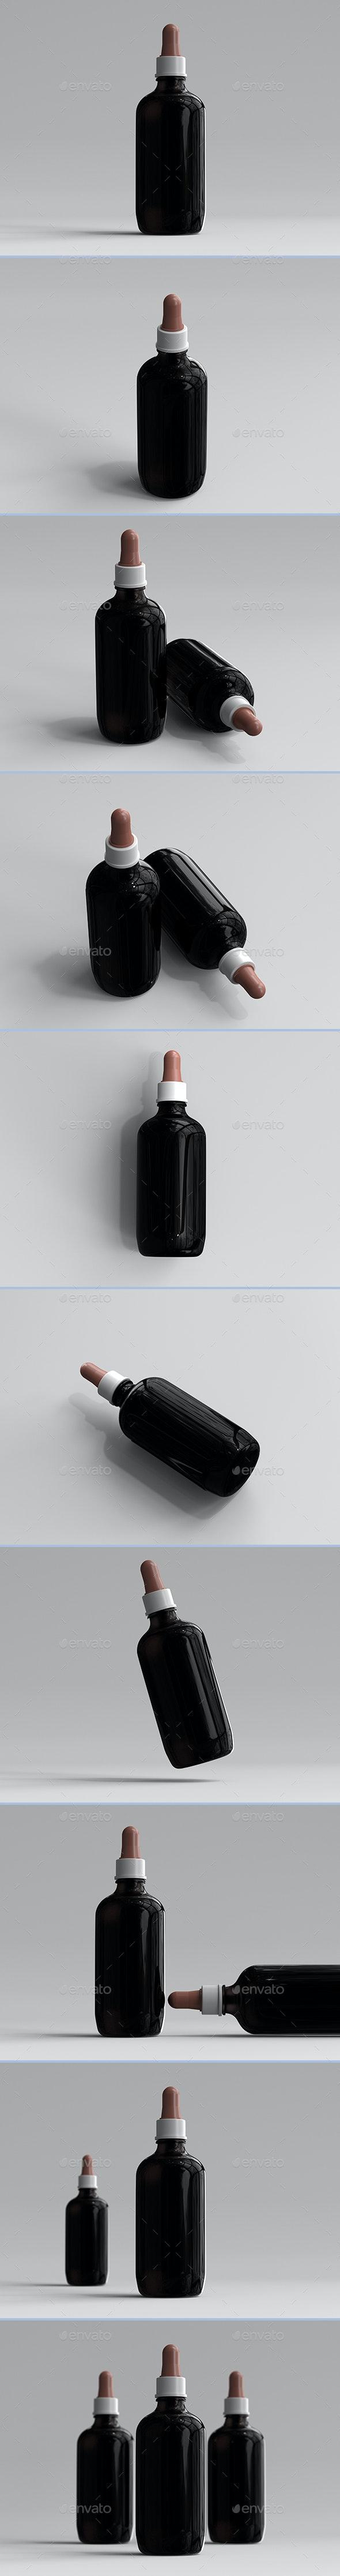 3D Rendered Large Amber Dropper Bottles - Objects 3D Renders